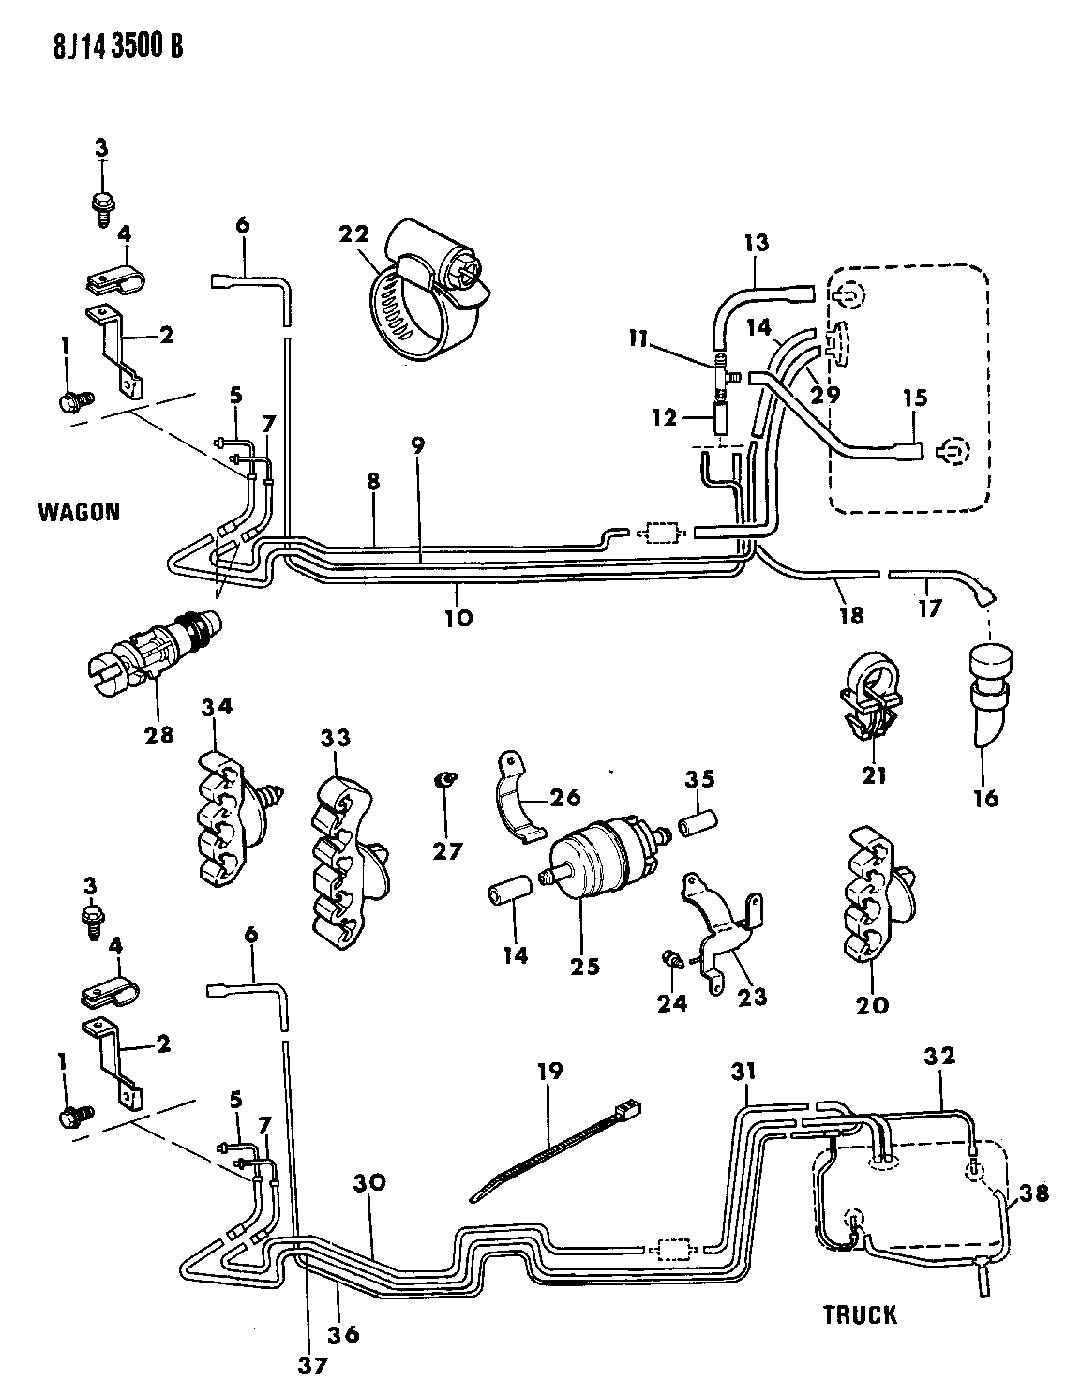 1989 jeep wrangler fuel line